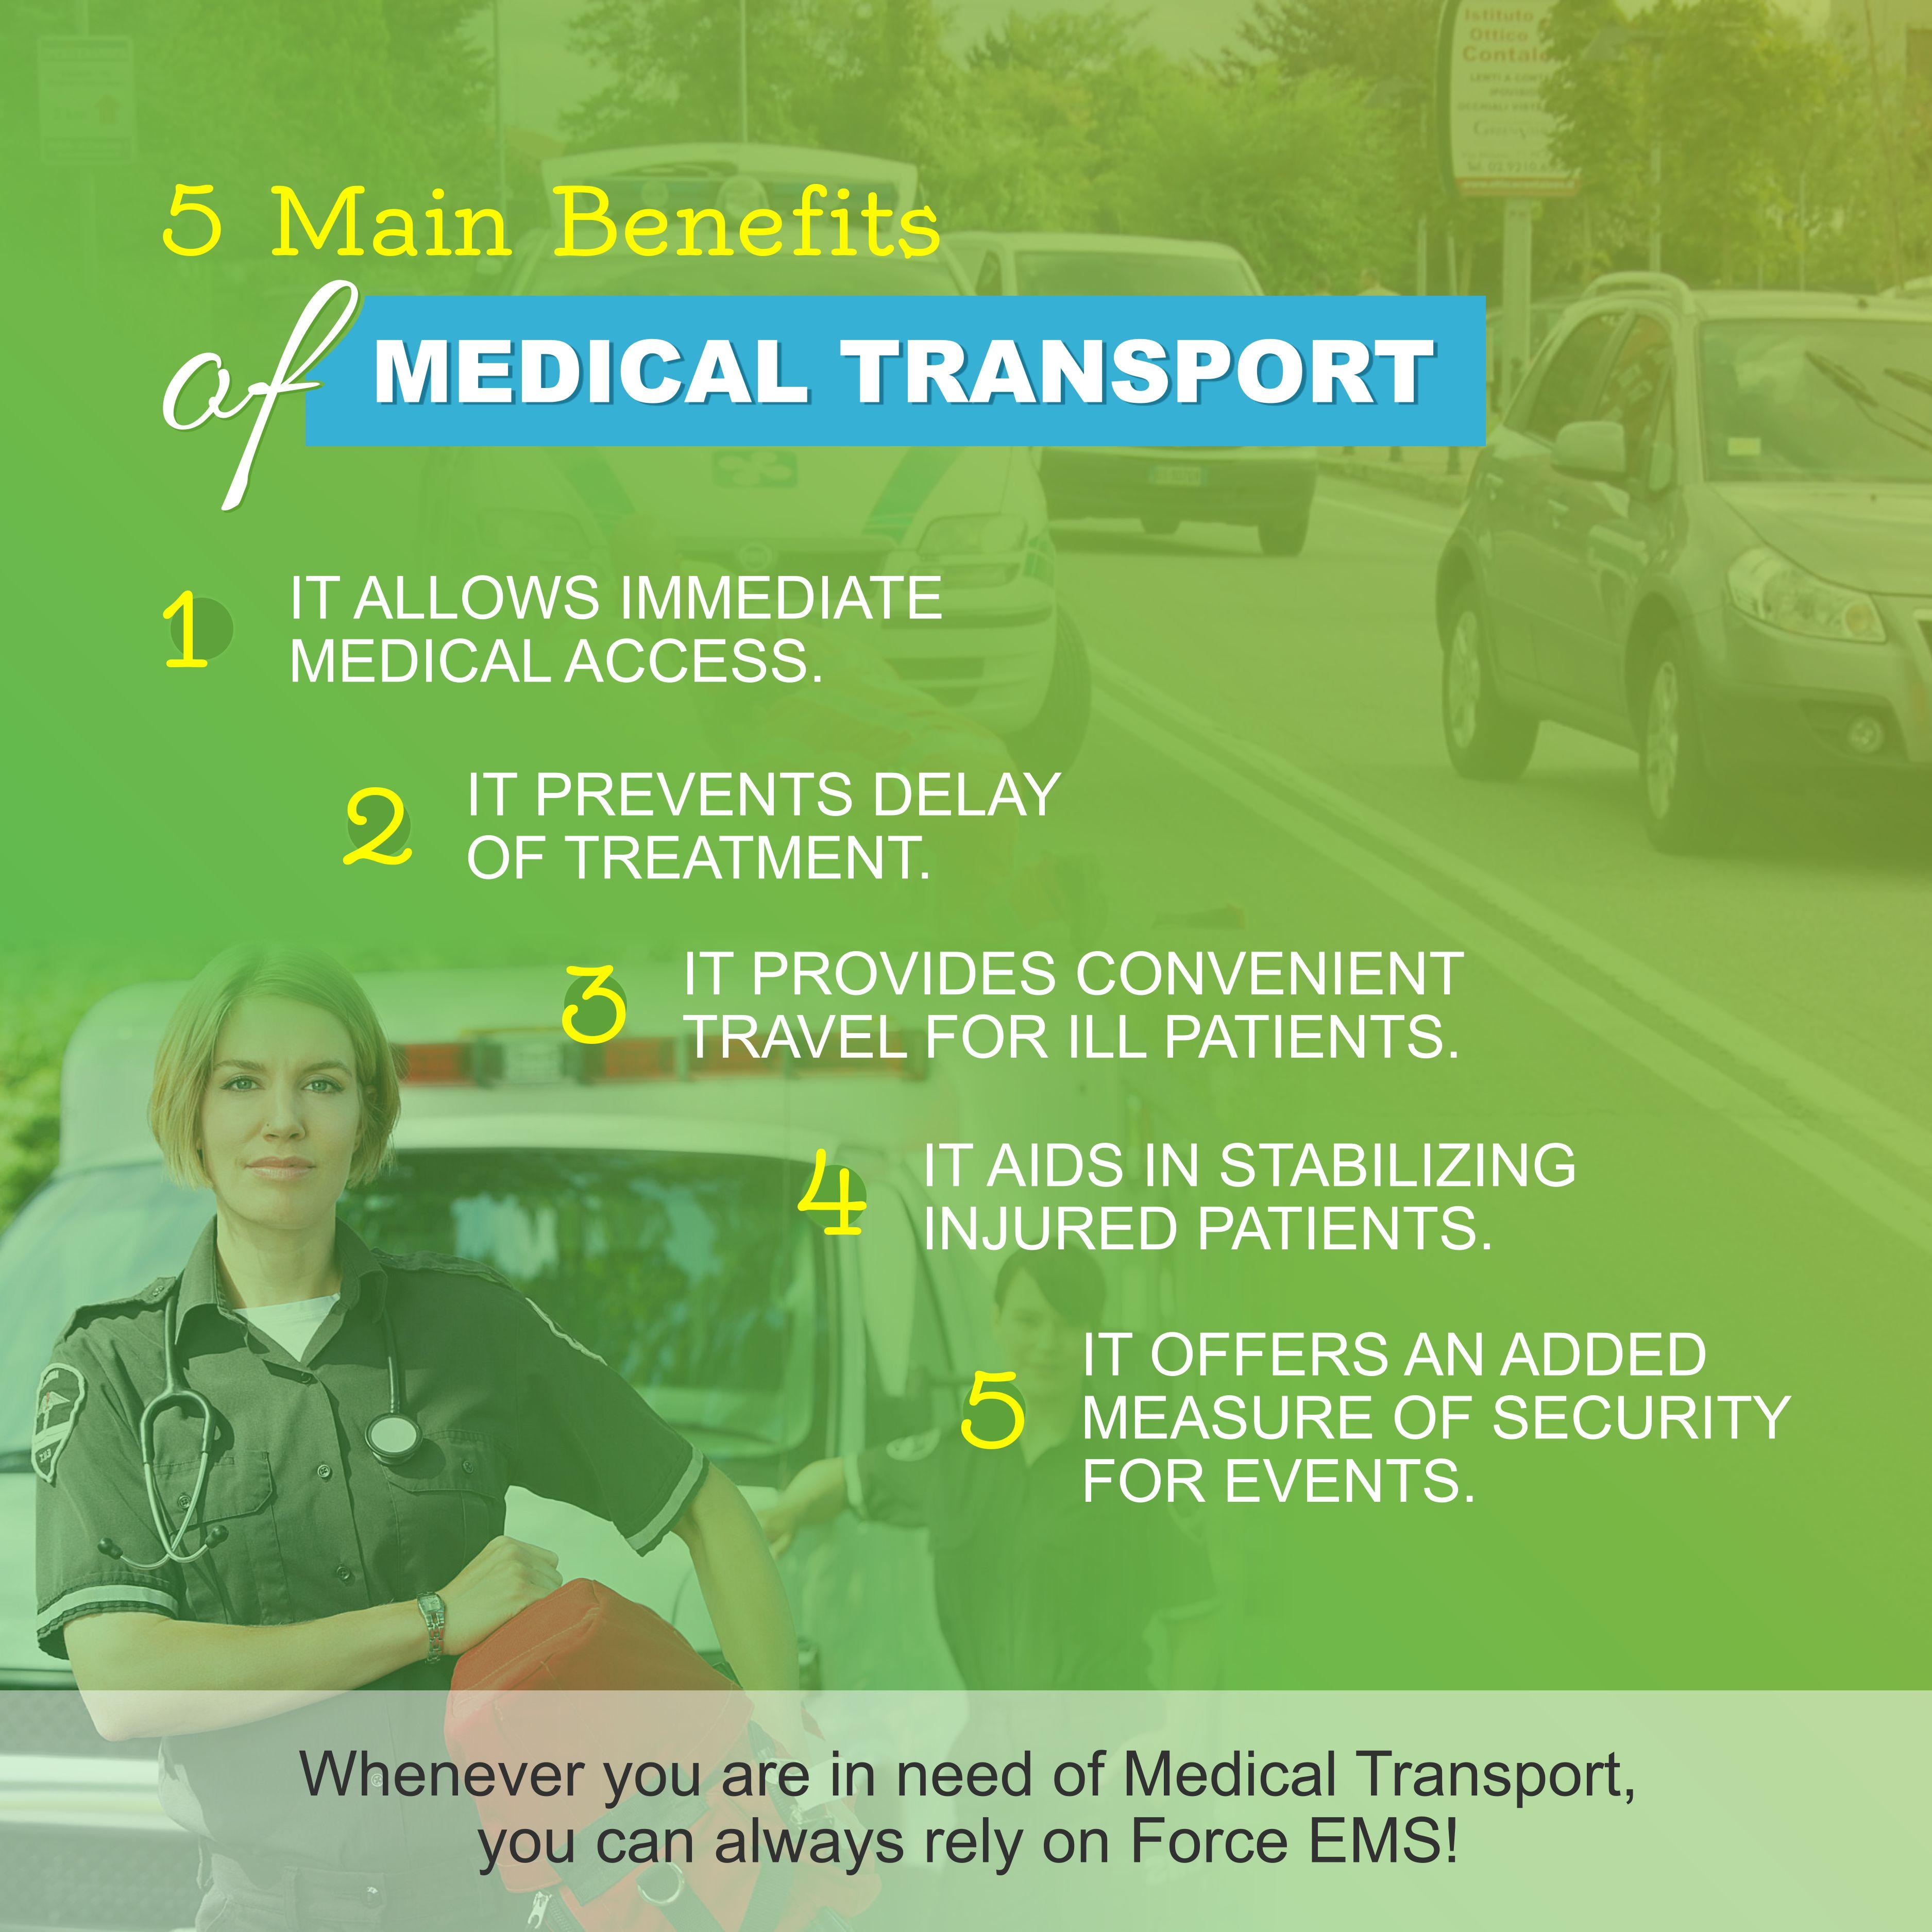 5 Main Benefits of Medical Transport Benefits